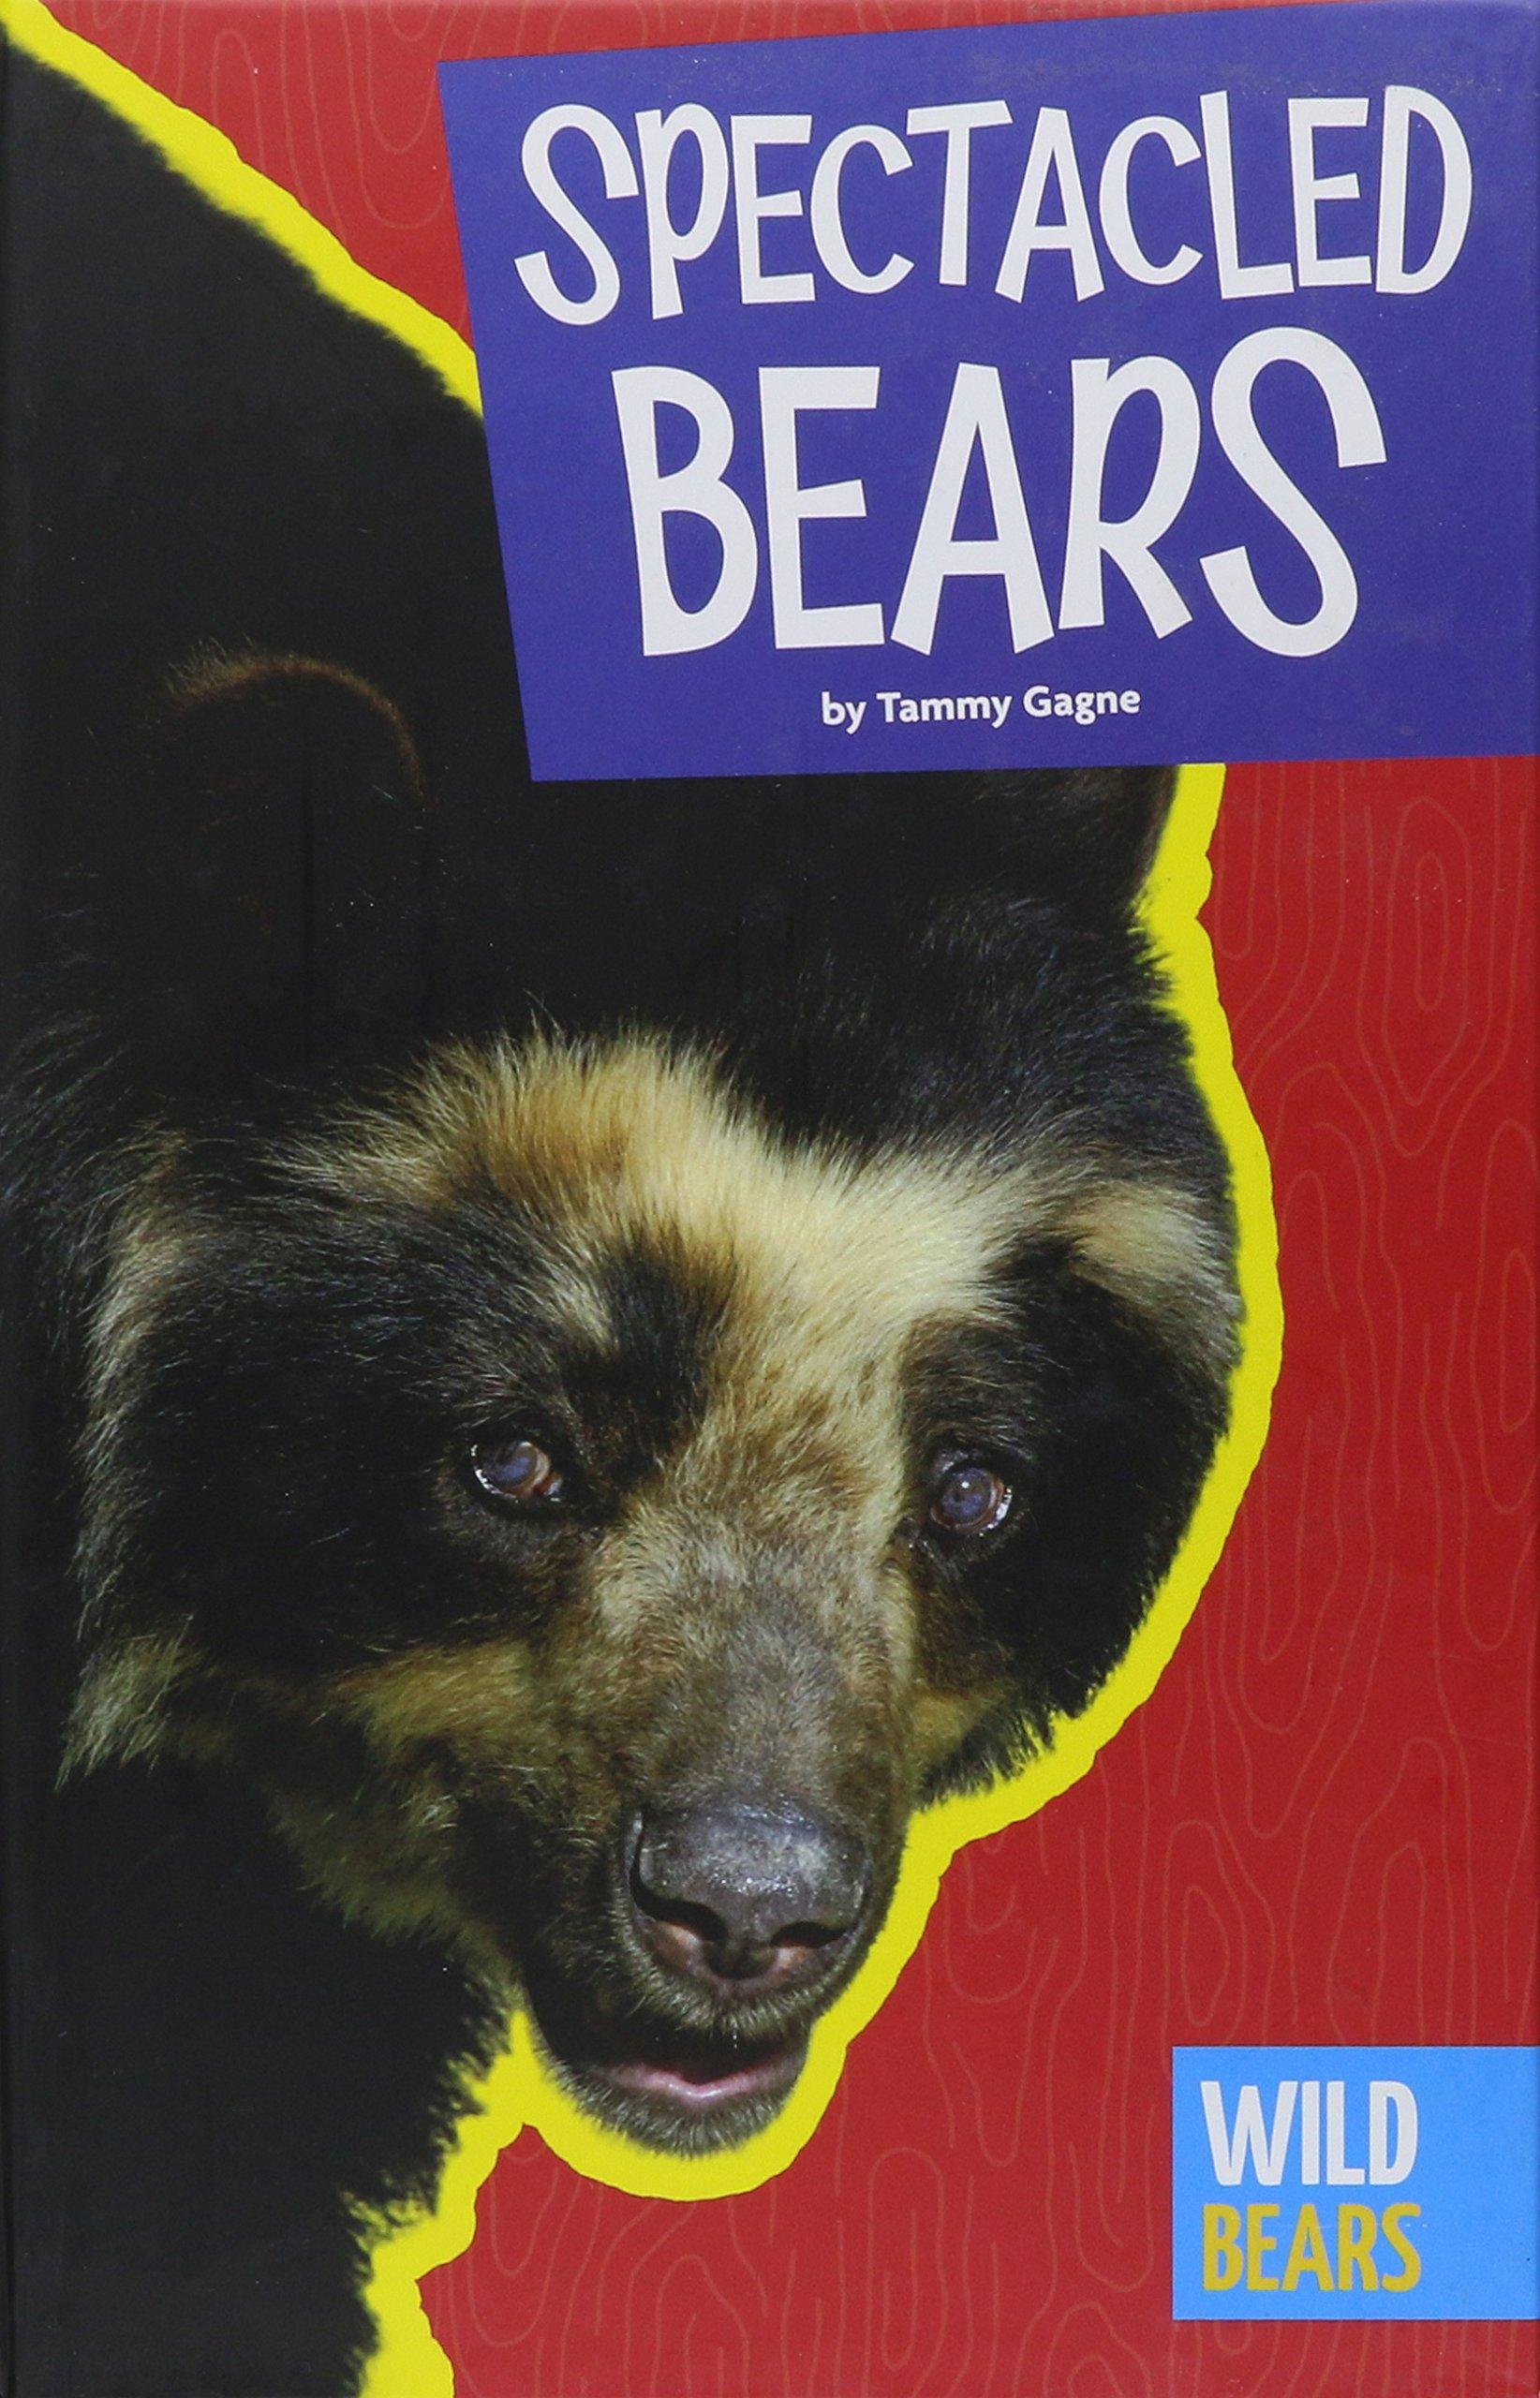 Download Spectacled Bears (Wild Bears) ePub fb2 ebook